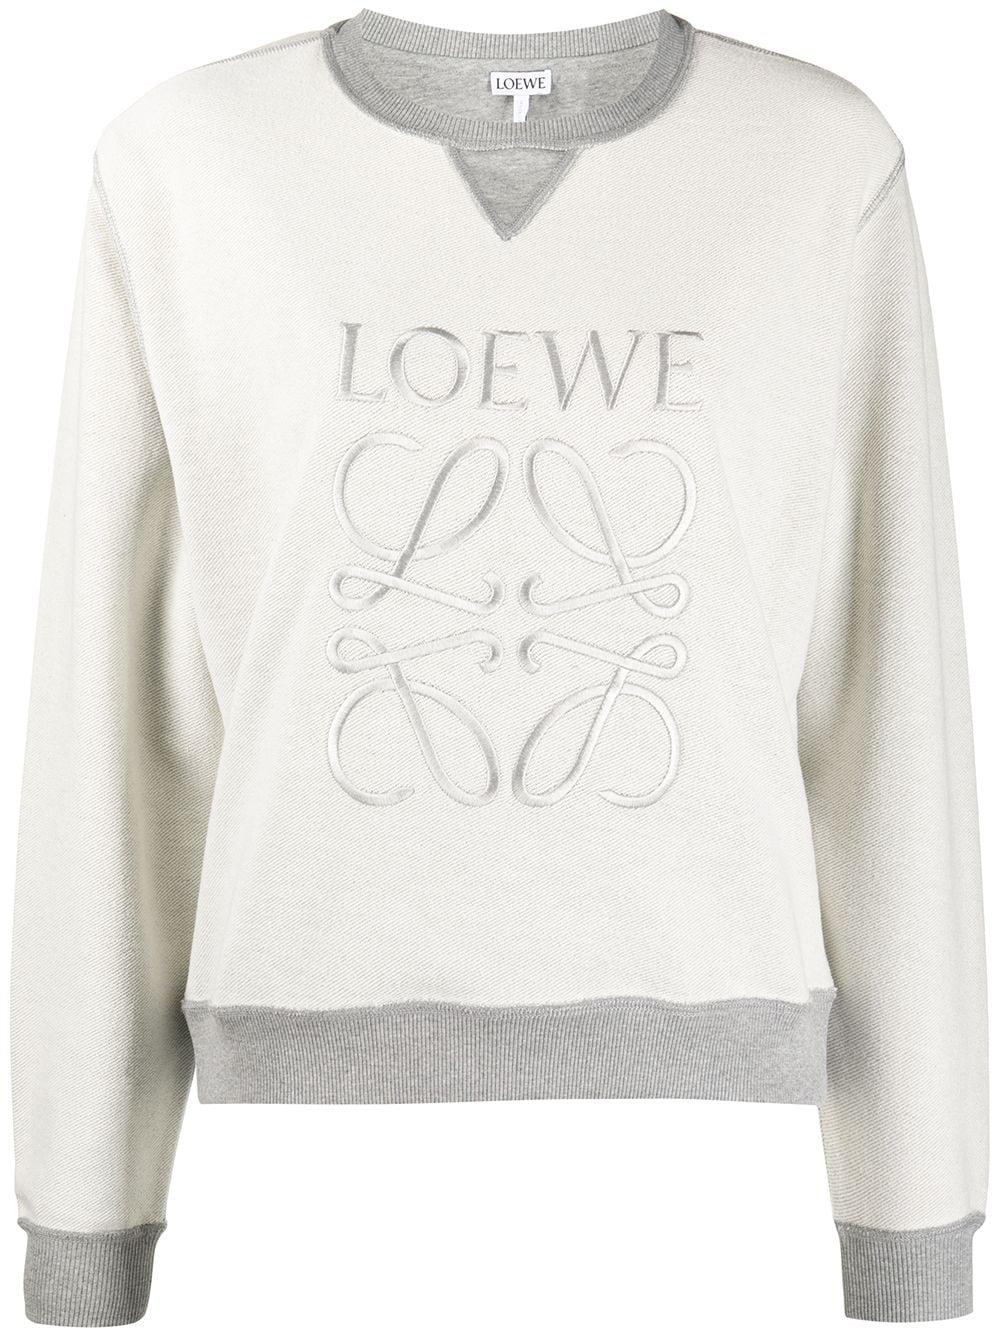 Immagine di Loewe | Anagram Sweatshirt